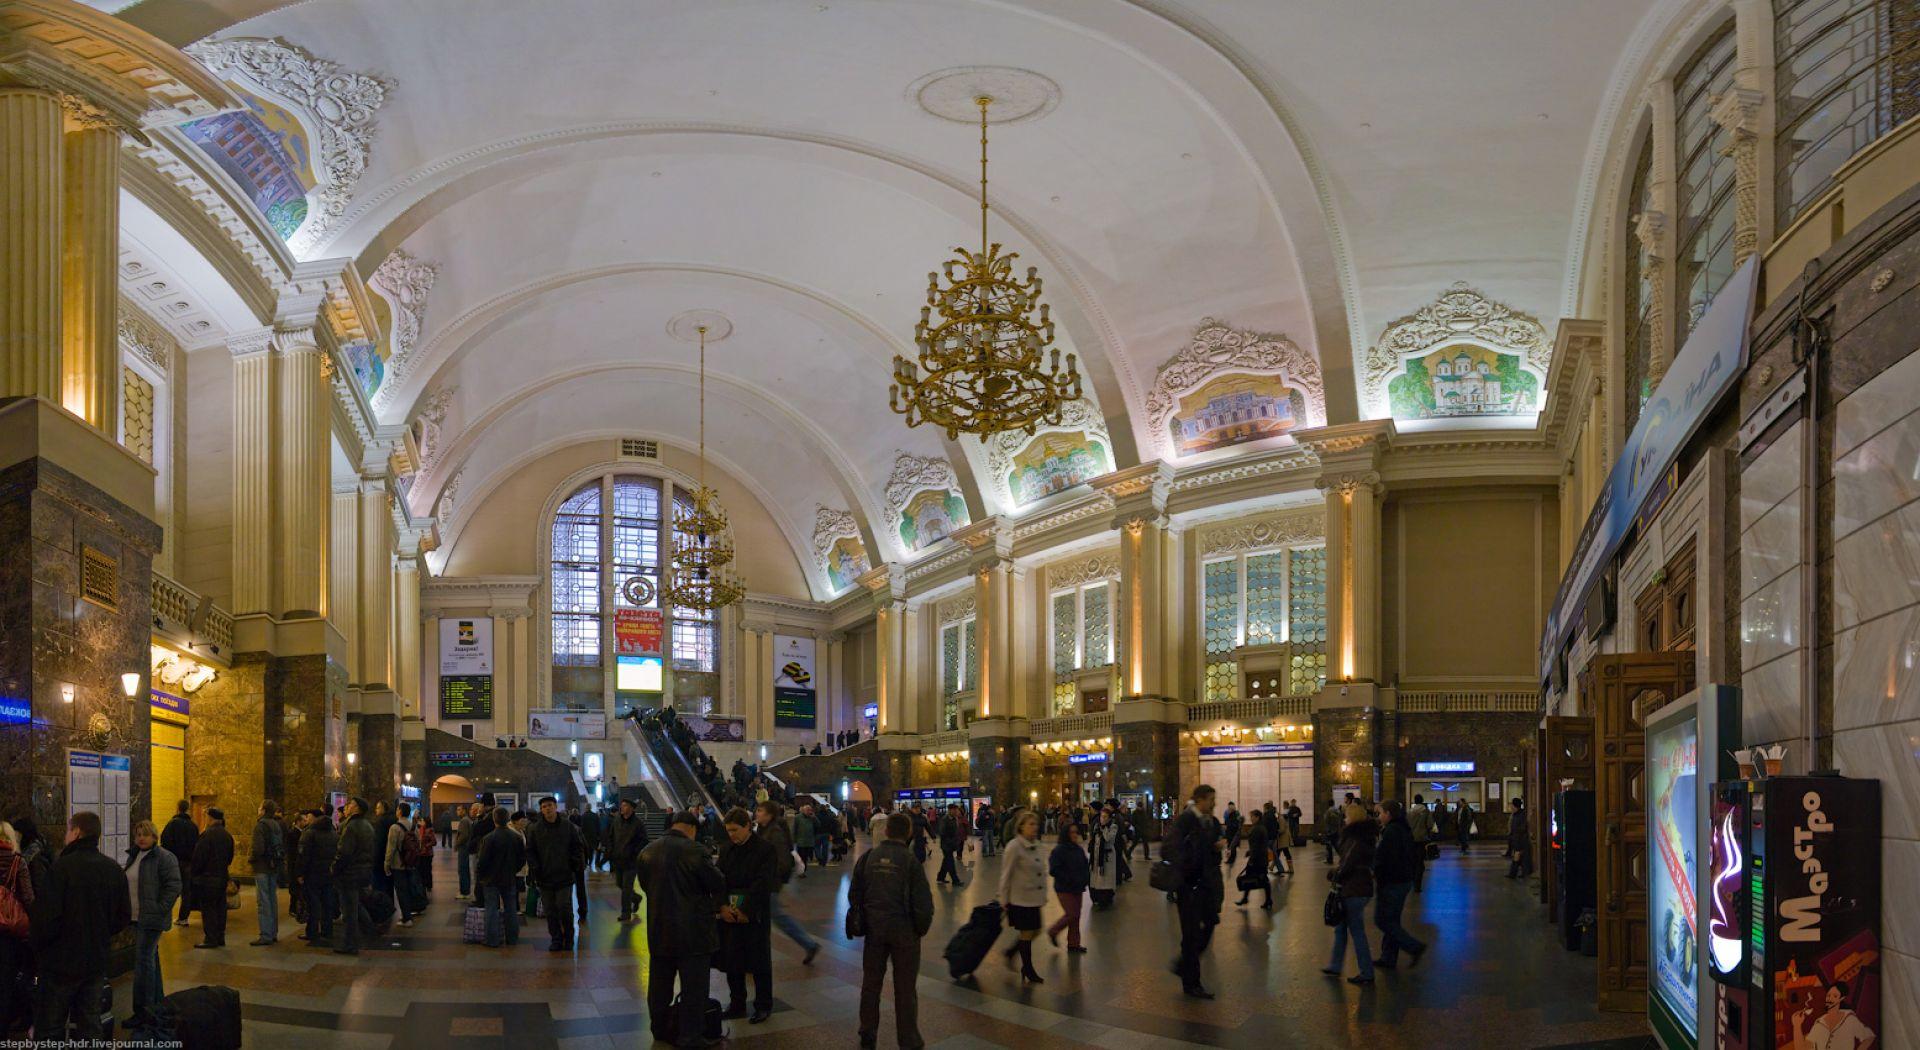 На київському вокзалі роми намагалися пограбувати відому телеведучу -  - 3a93e06a79b58e8e24434c313eb7a045 XL